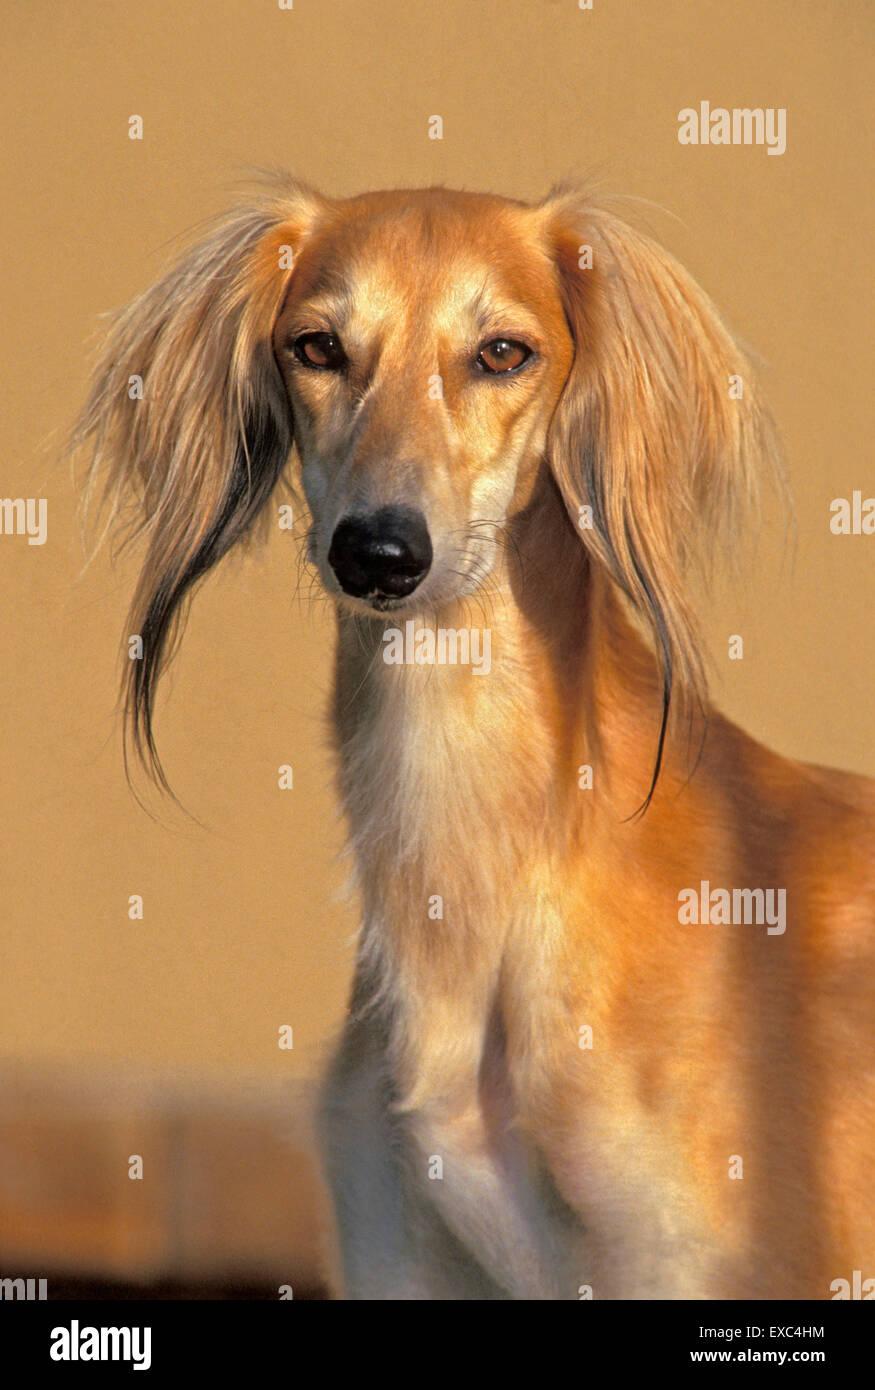 Hund Saluki männlich, Porträt Stockbild